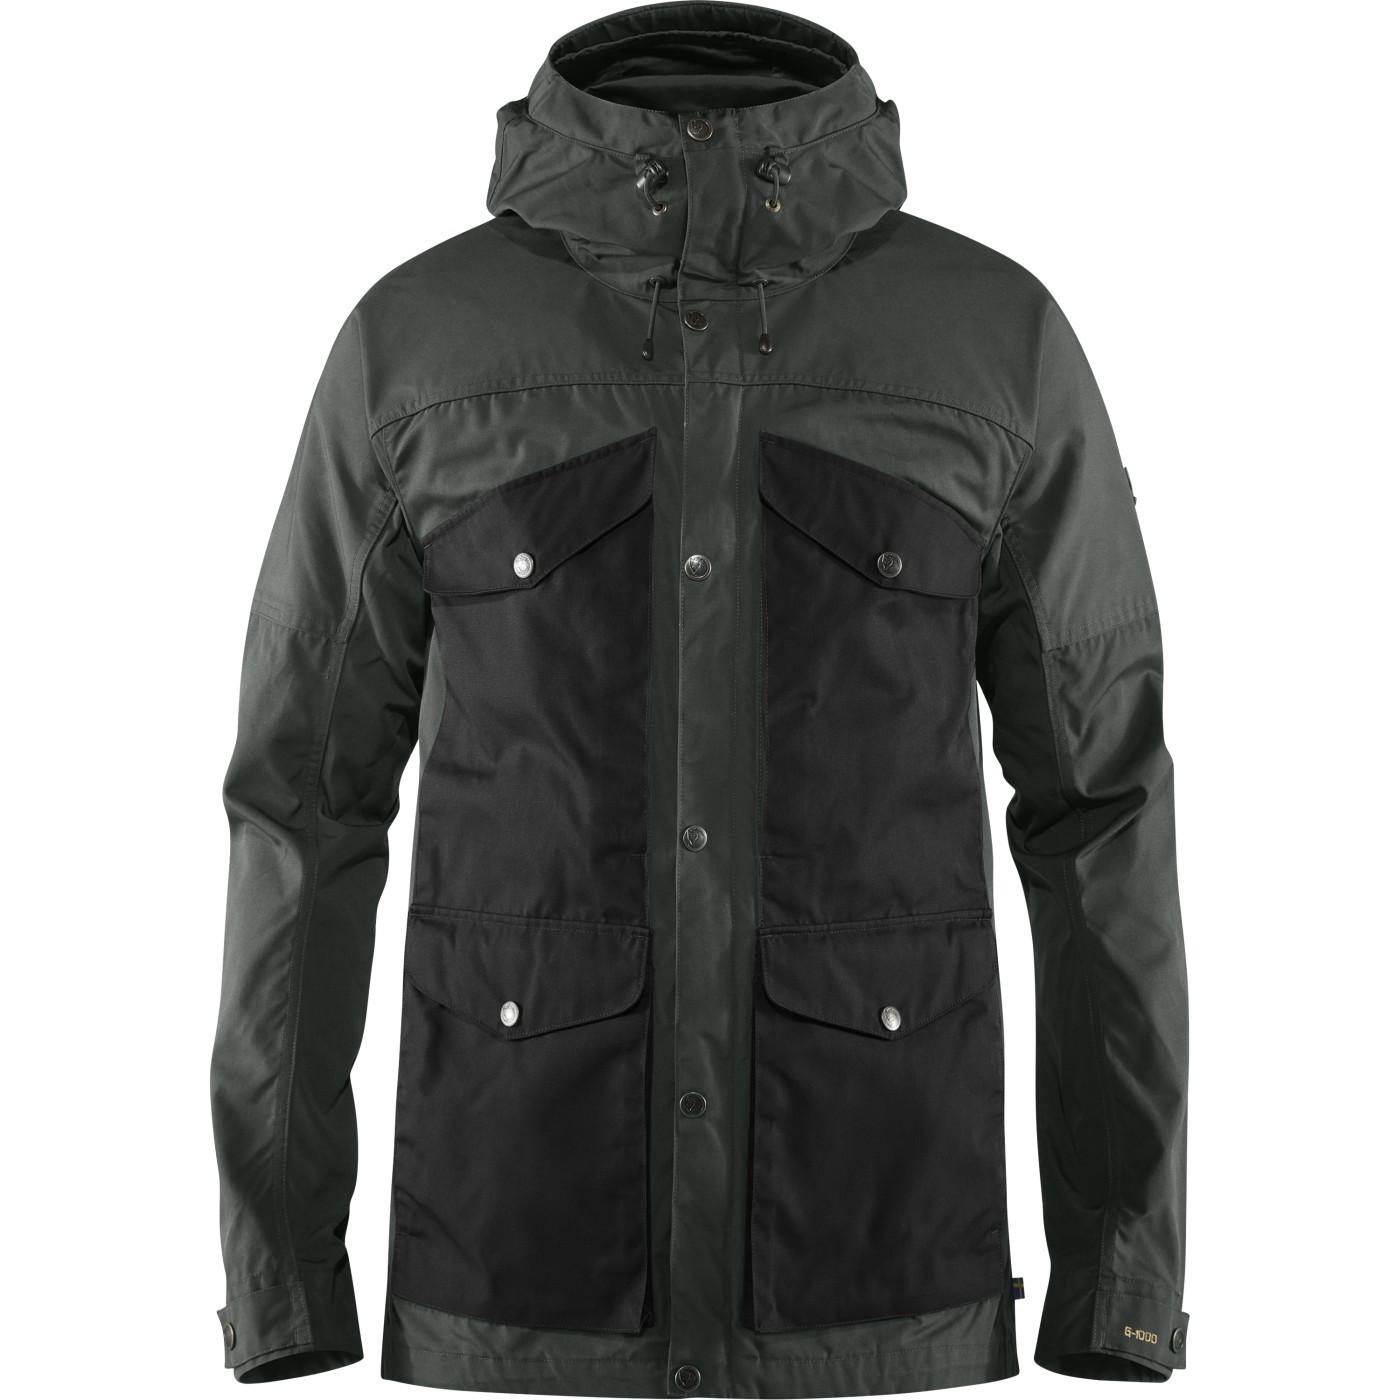 FjallRaven Vidda Pro Jacket M